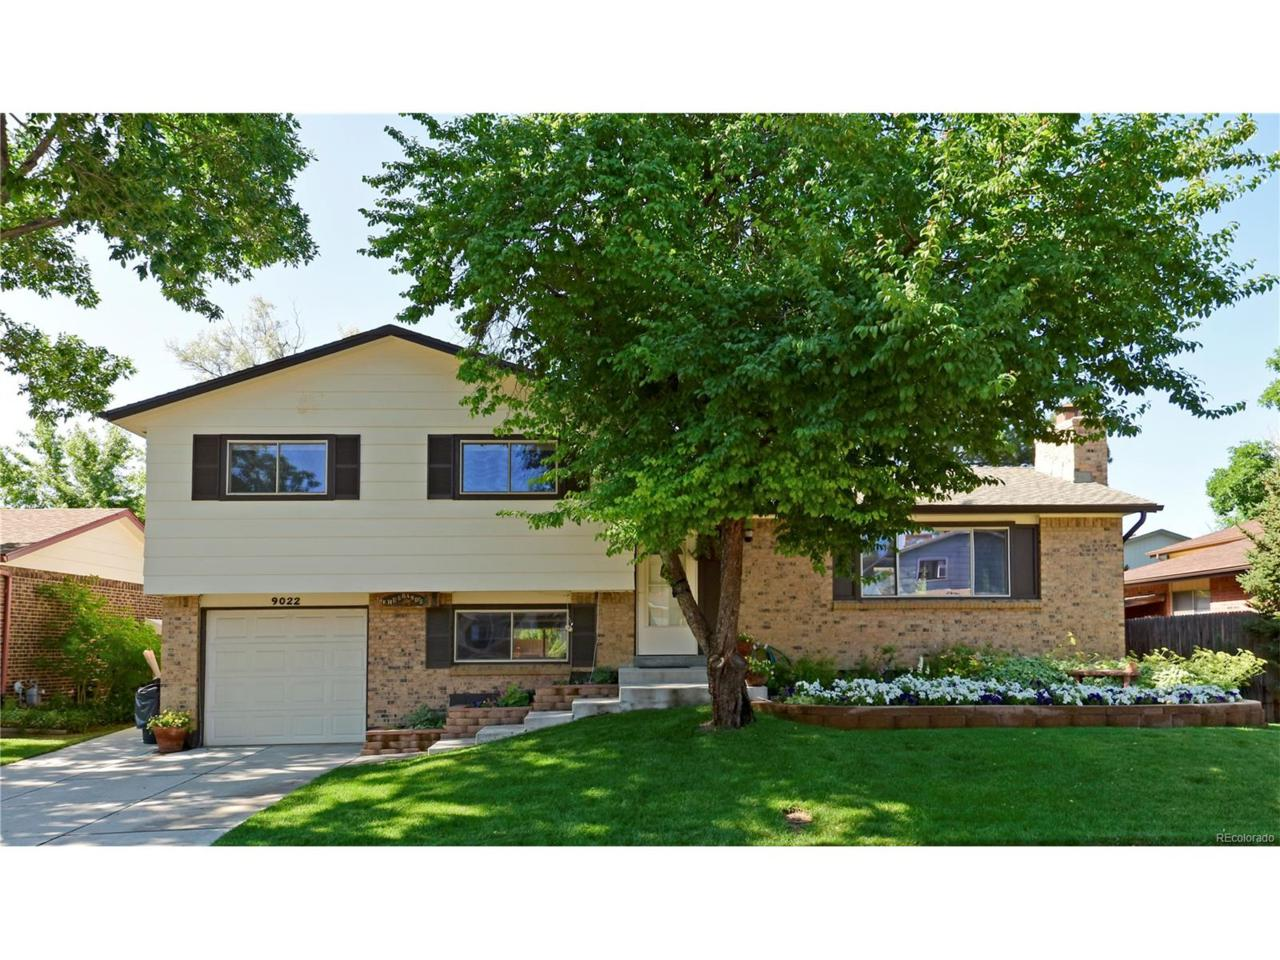 9022 W Arbor Avenue, Littleton, CO 80123 (MLS #7662903) :: 8z Real Estate